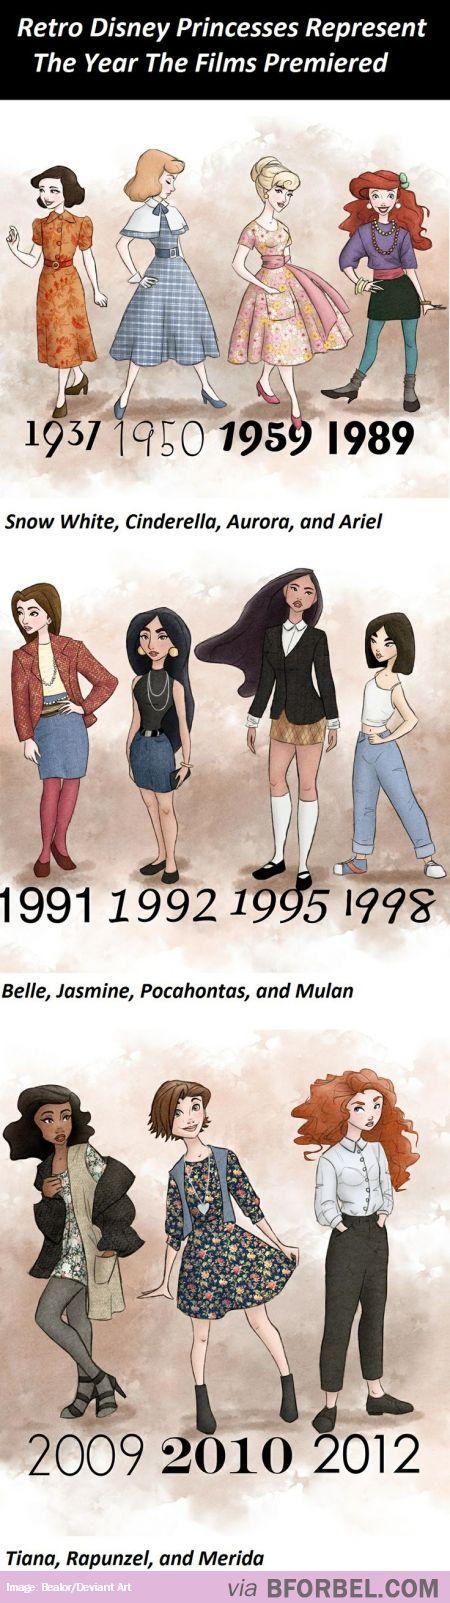 Disney Princesses and a pixar princess I love that they made Mulan and Jasmine shorter. Relatable ^.^